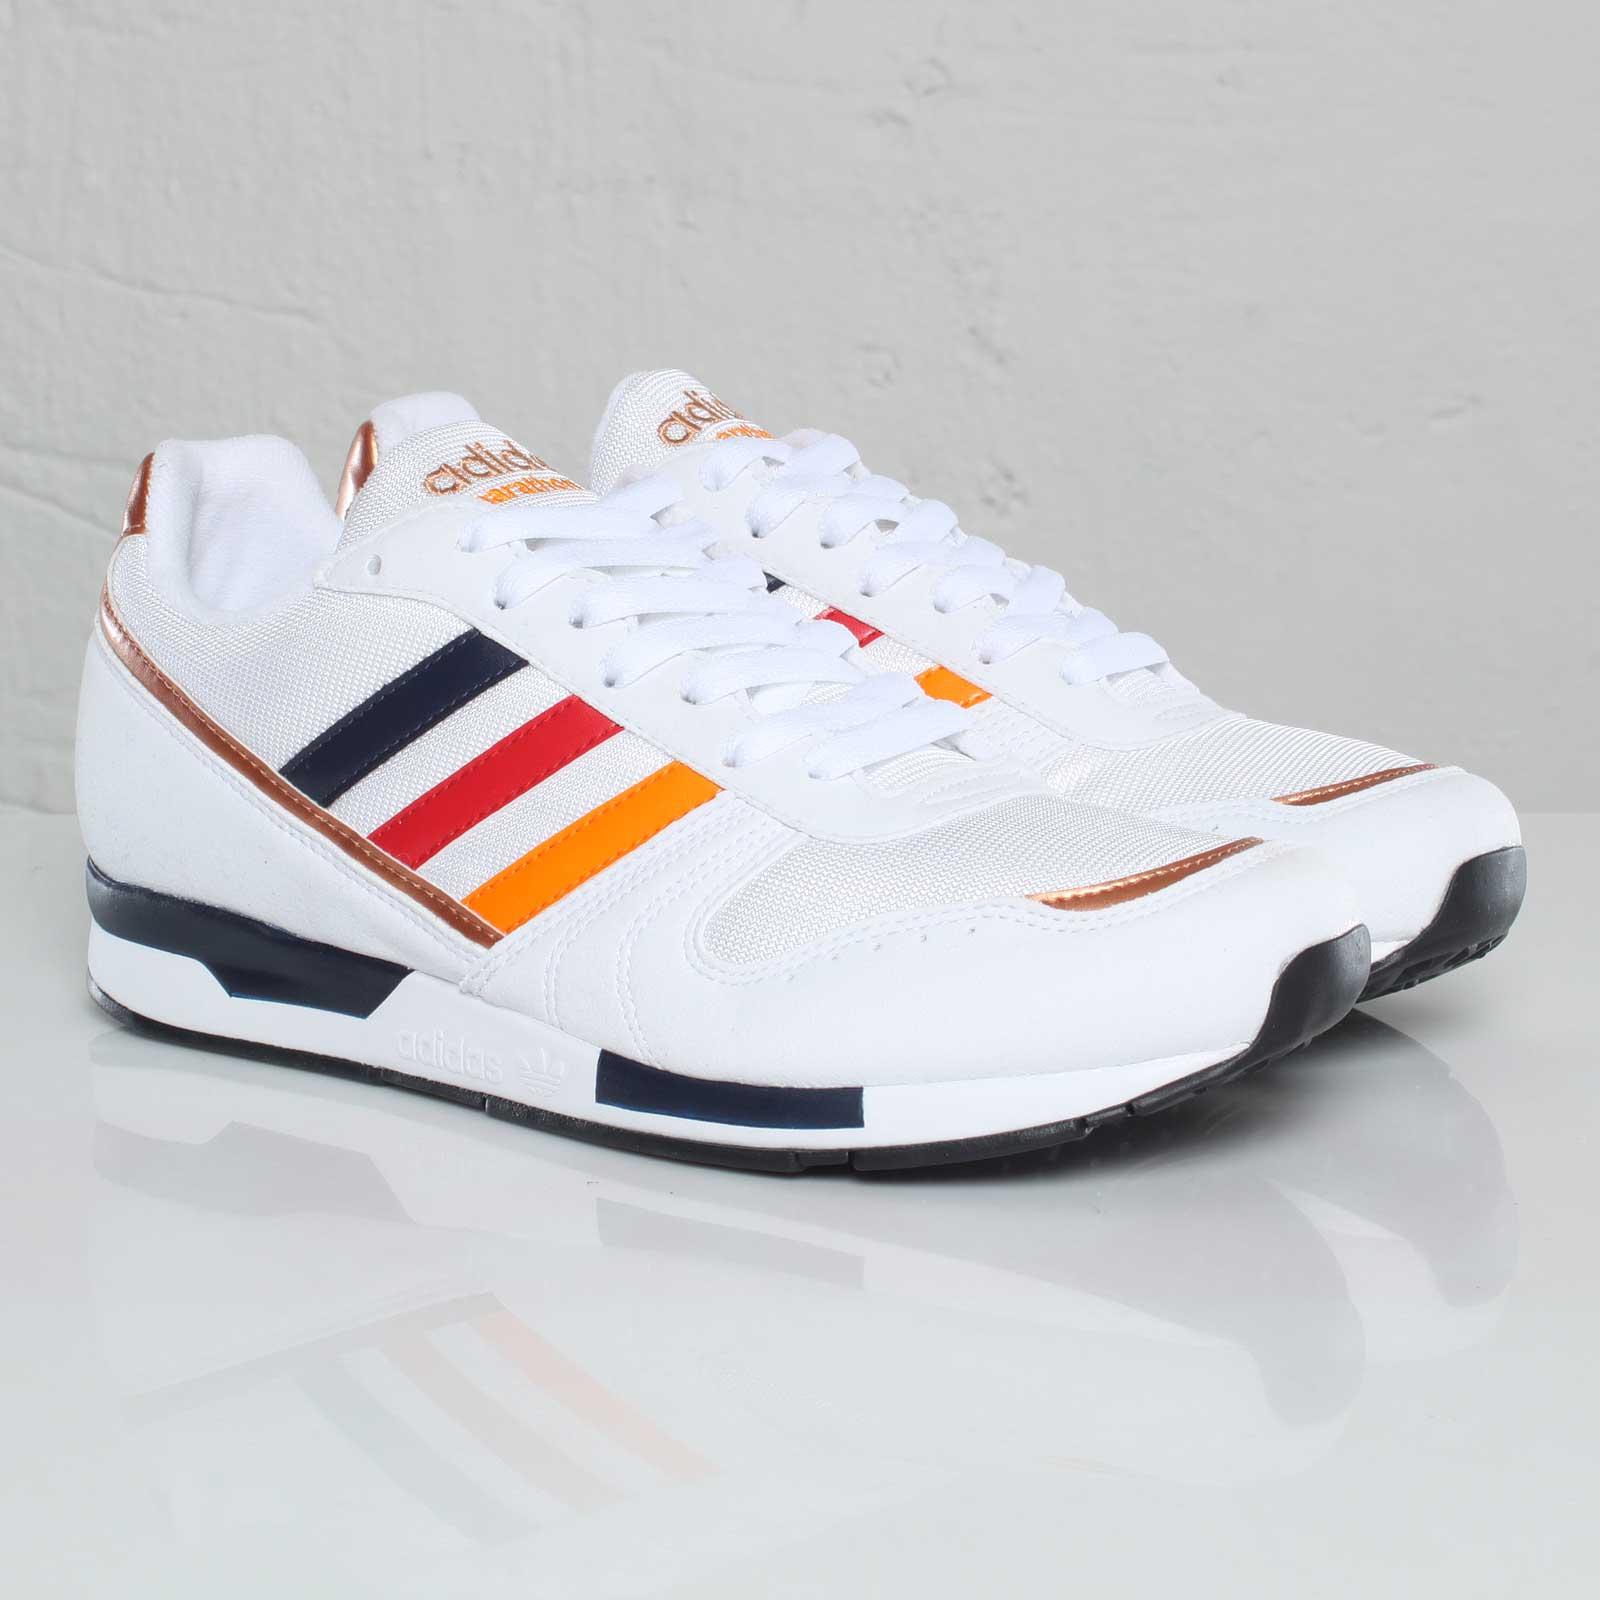 adidas Marathon 88 109070 Sneakersnstuff | sneakers